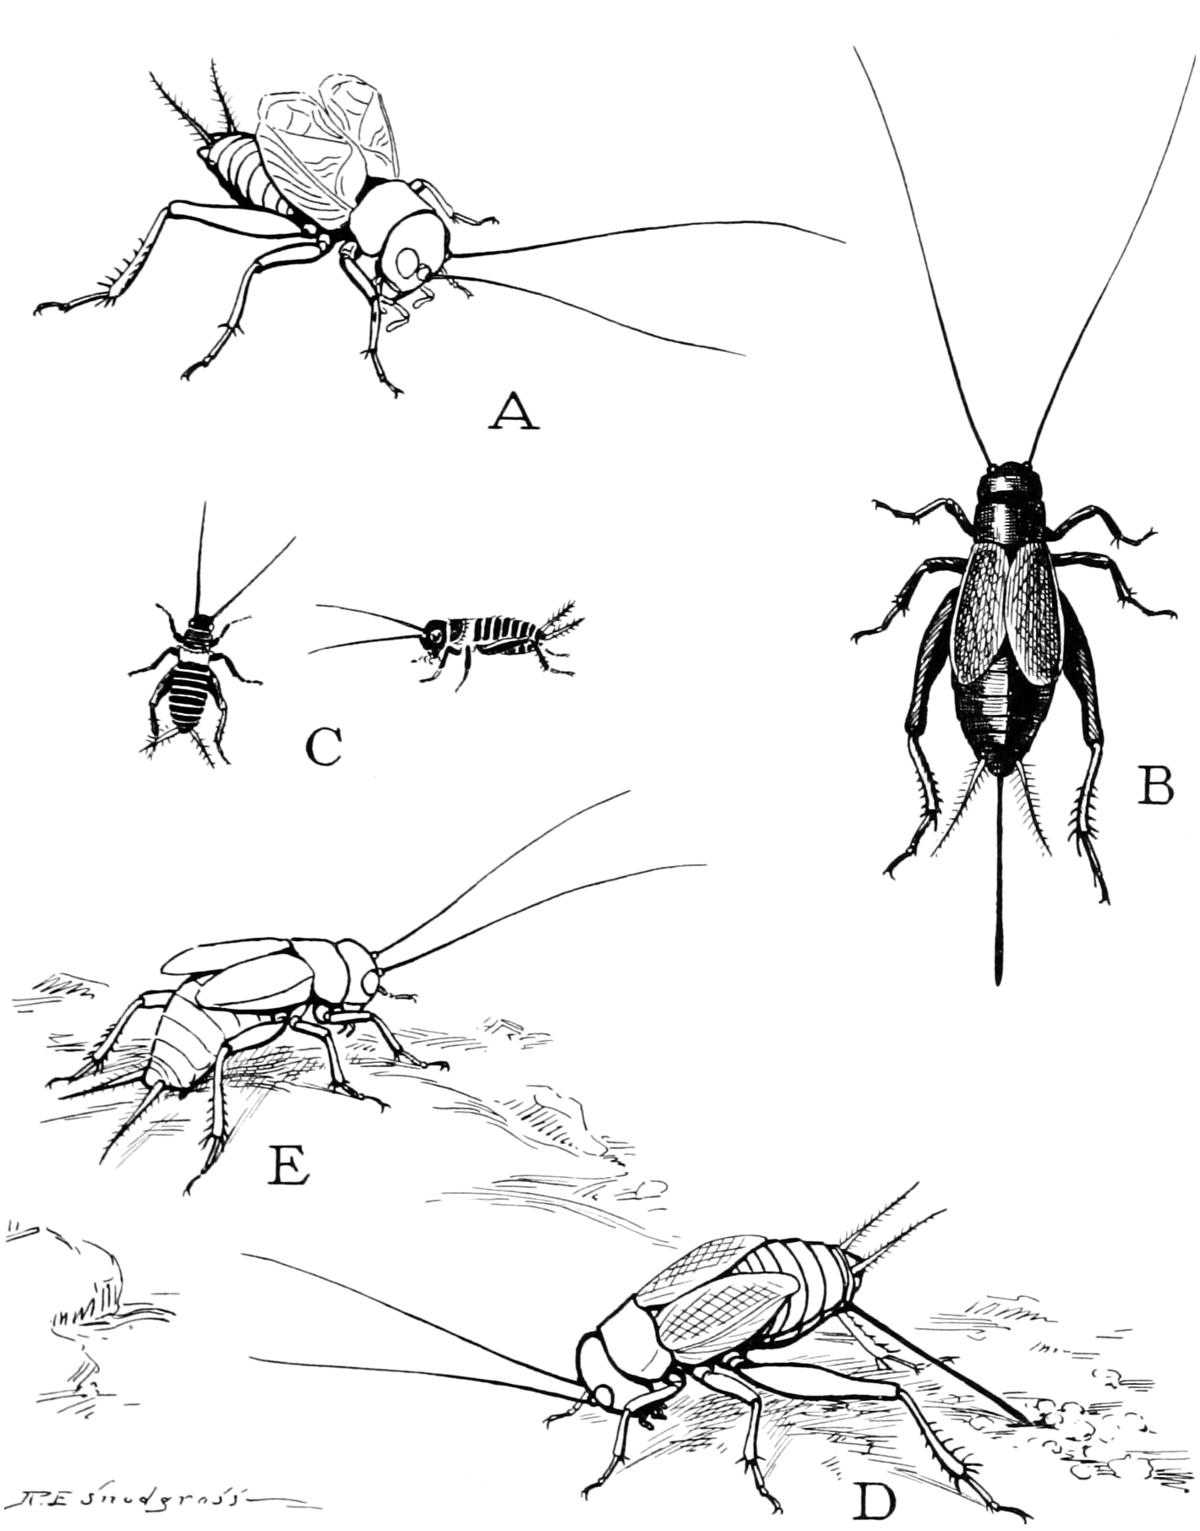 cricket life cycle diagram 2000 toyota corolla engine field wikipedia